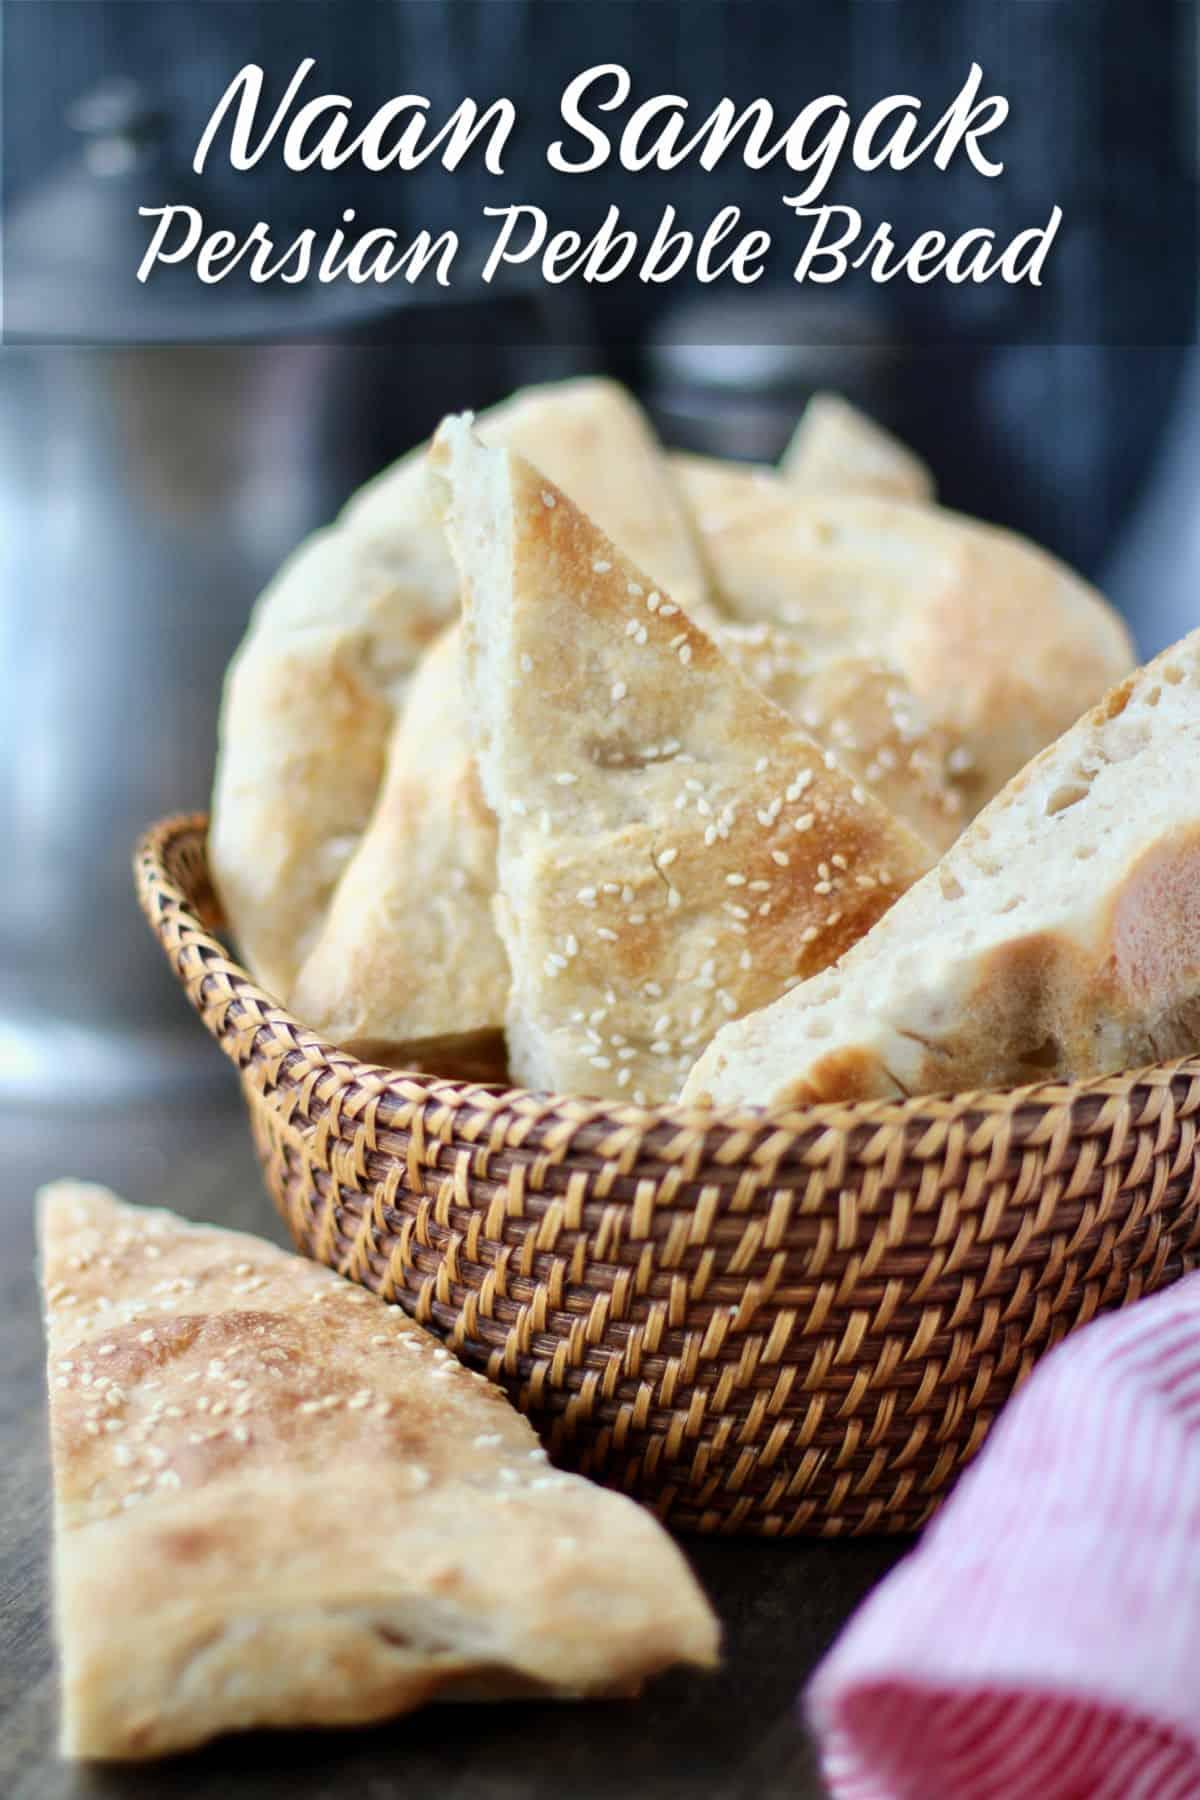 Persian Pebble Bread in basket